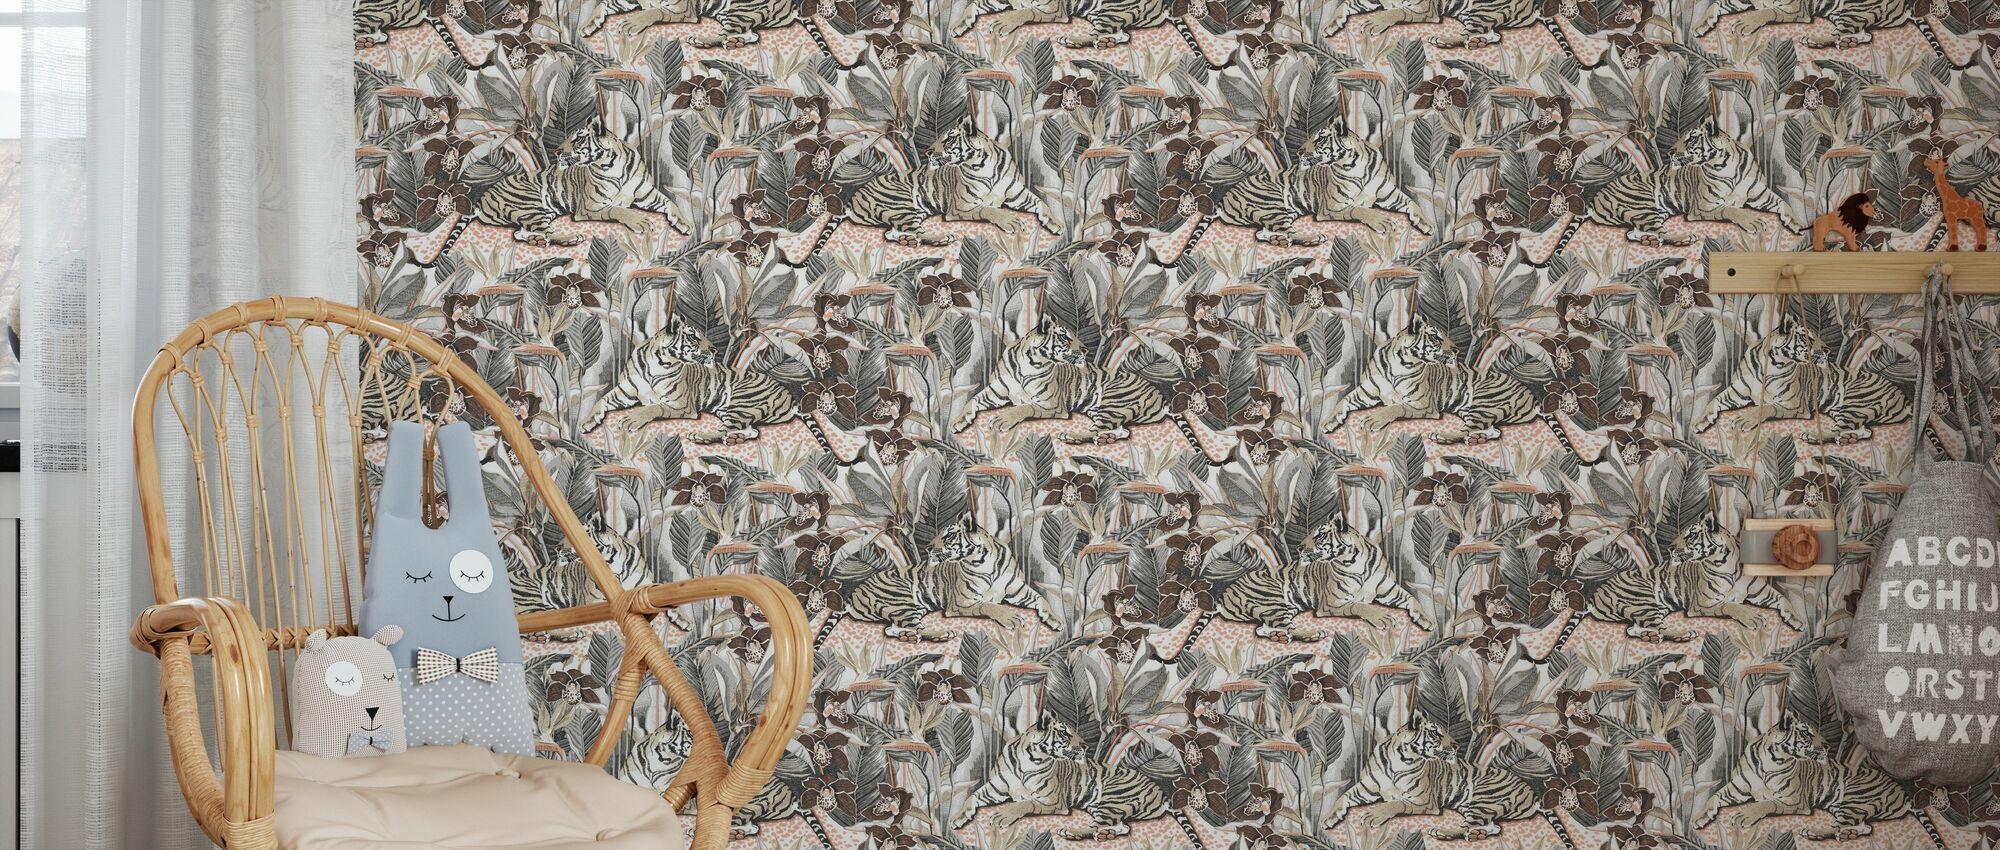 Resting Tigress - Chocolate and Steel - Wallpaper - Kids Room